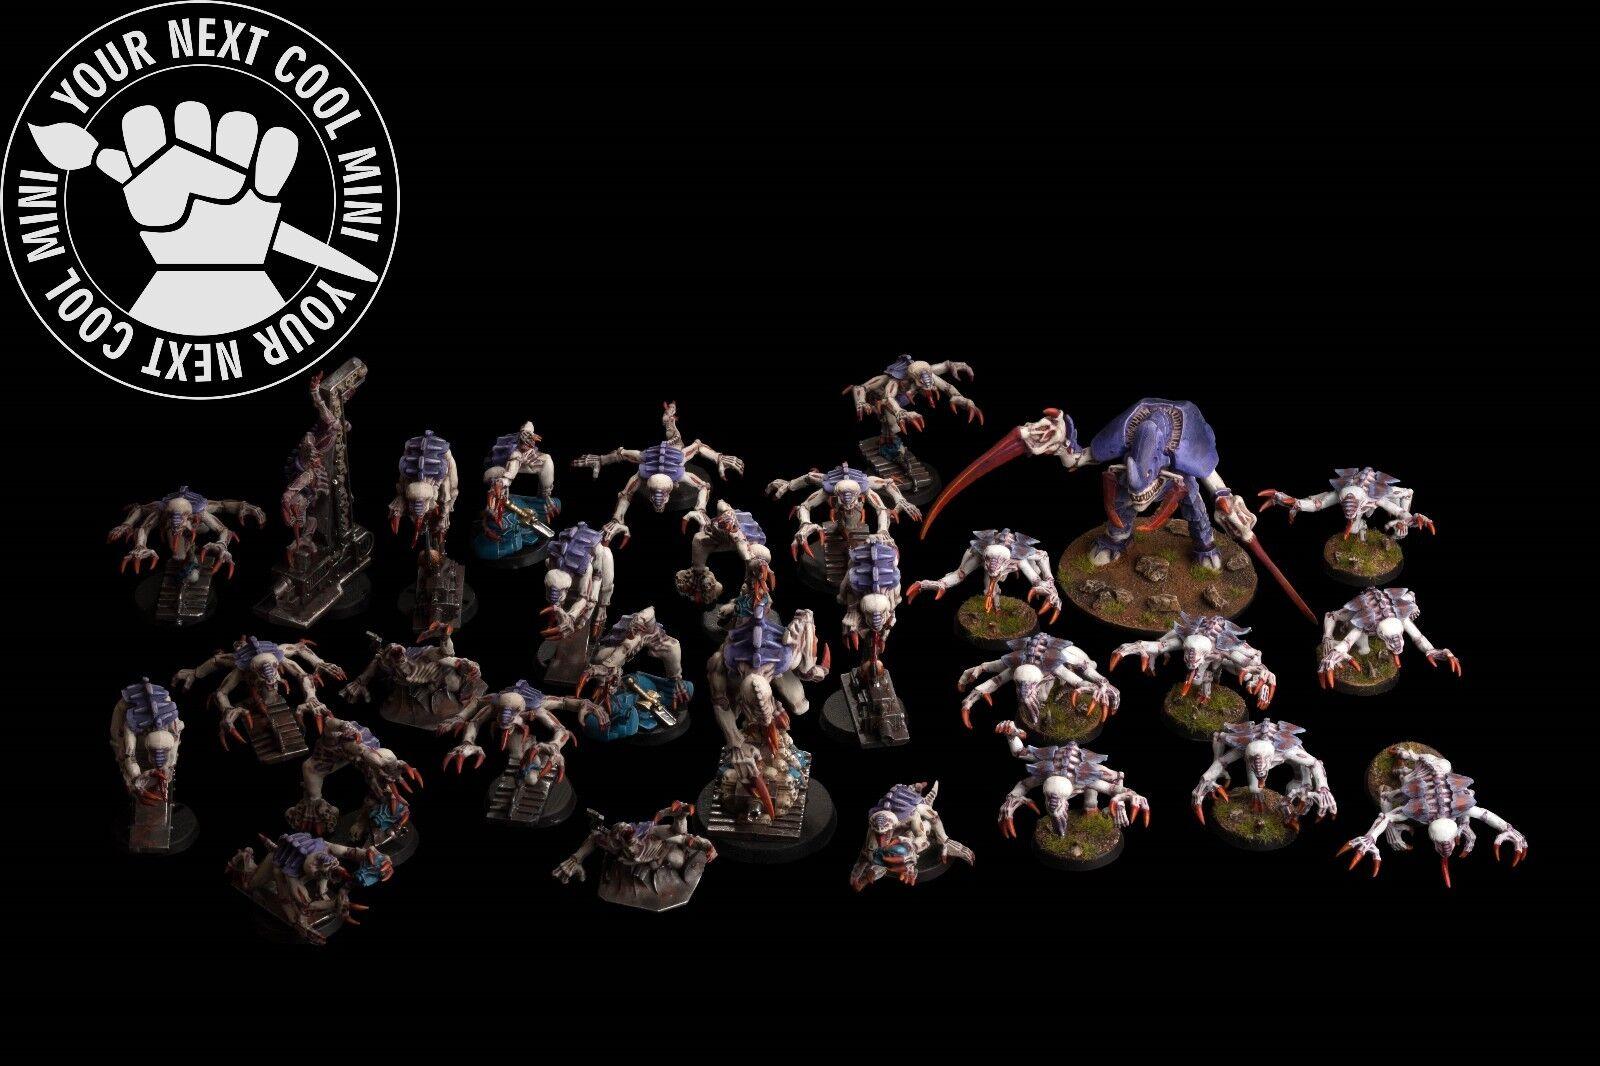 Warhammer 40K Tyranids Army, 28 plastica minis 1 metal Minis PRO PAINT magnetizzato